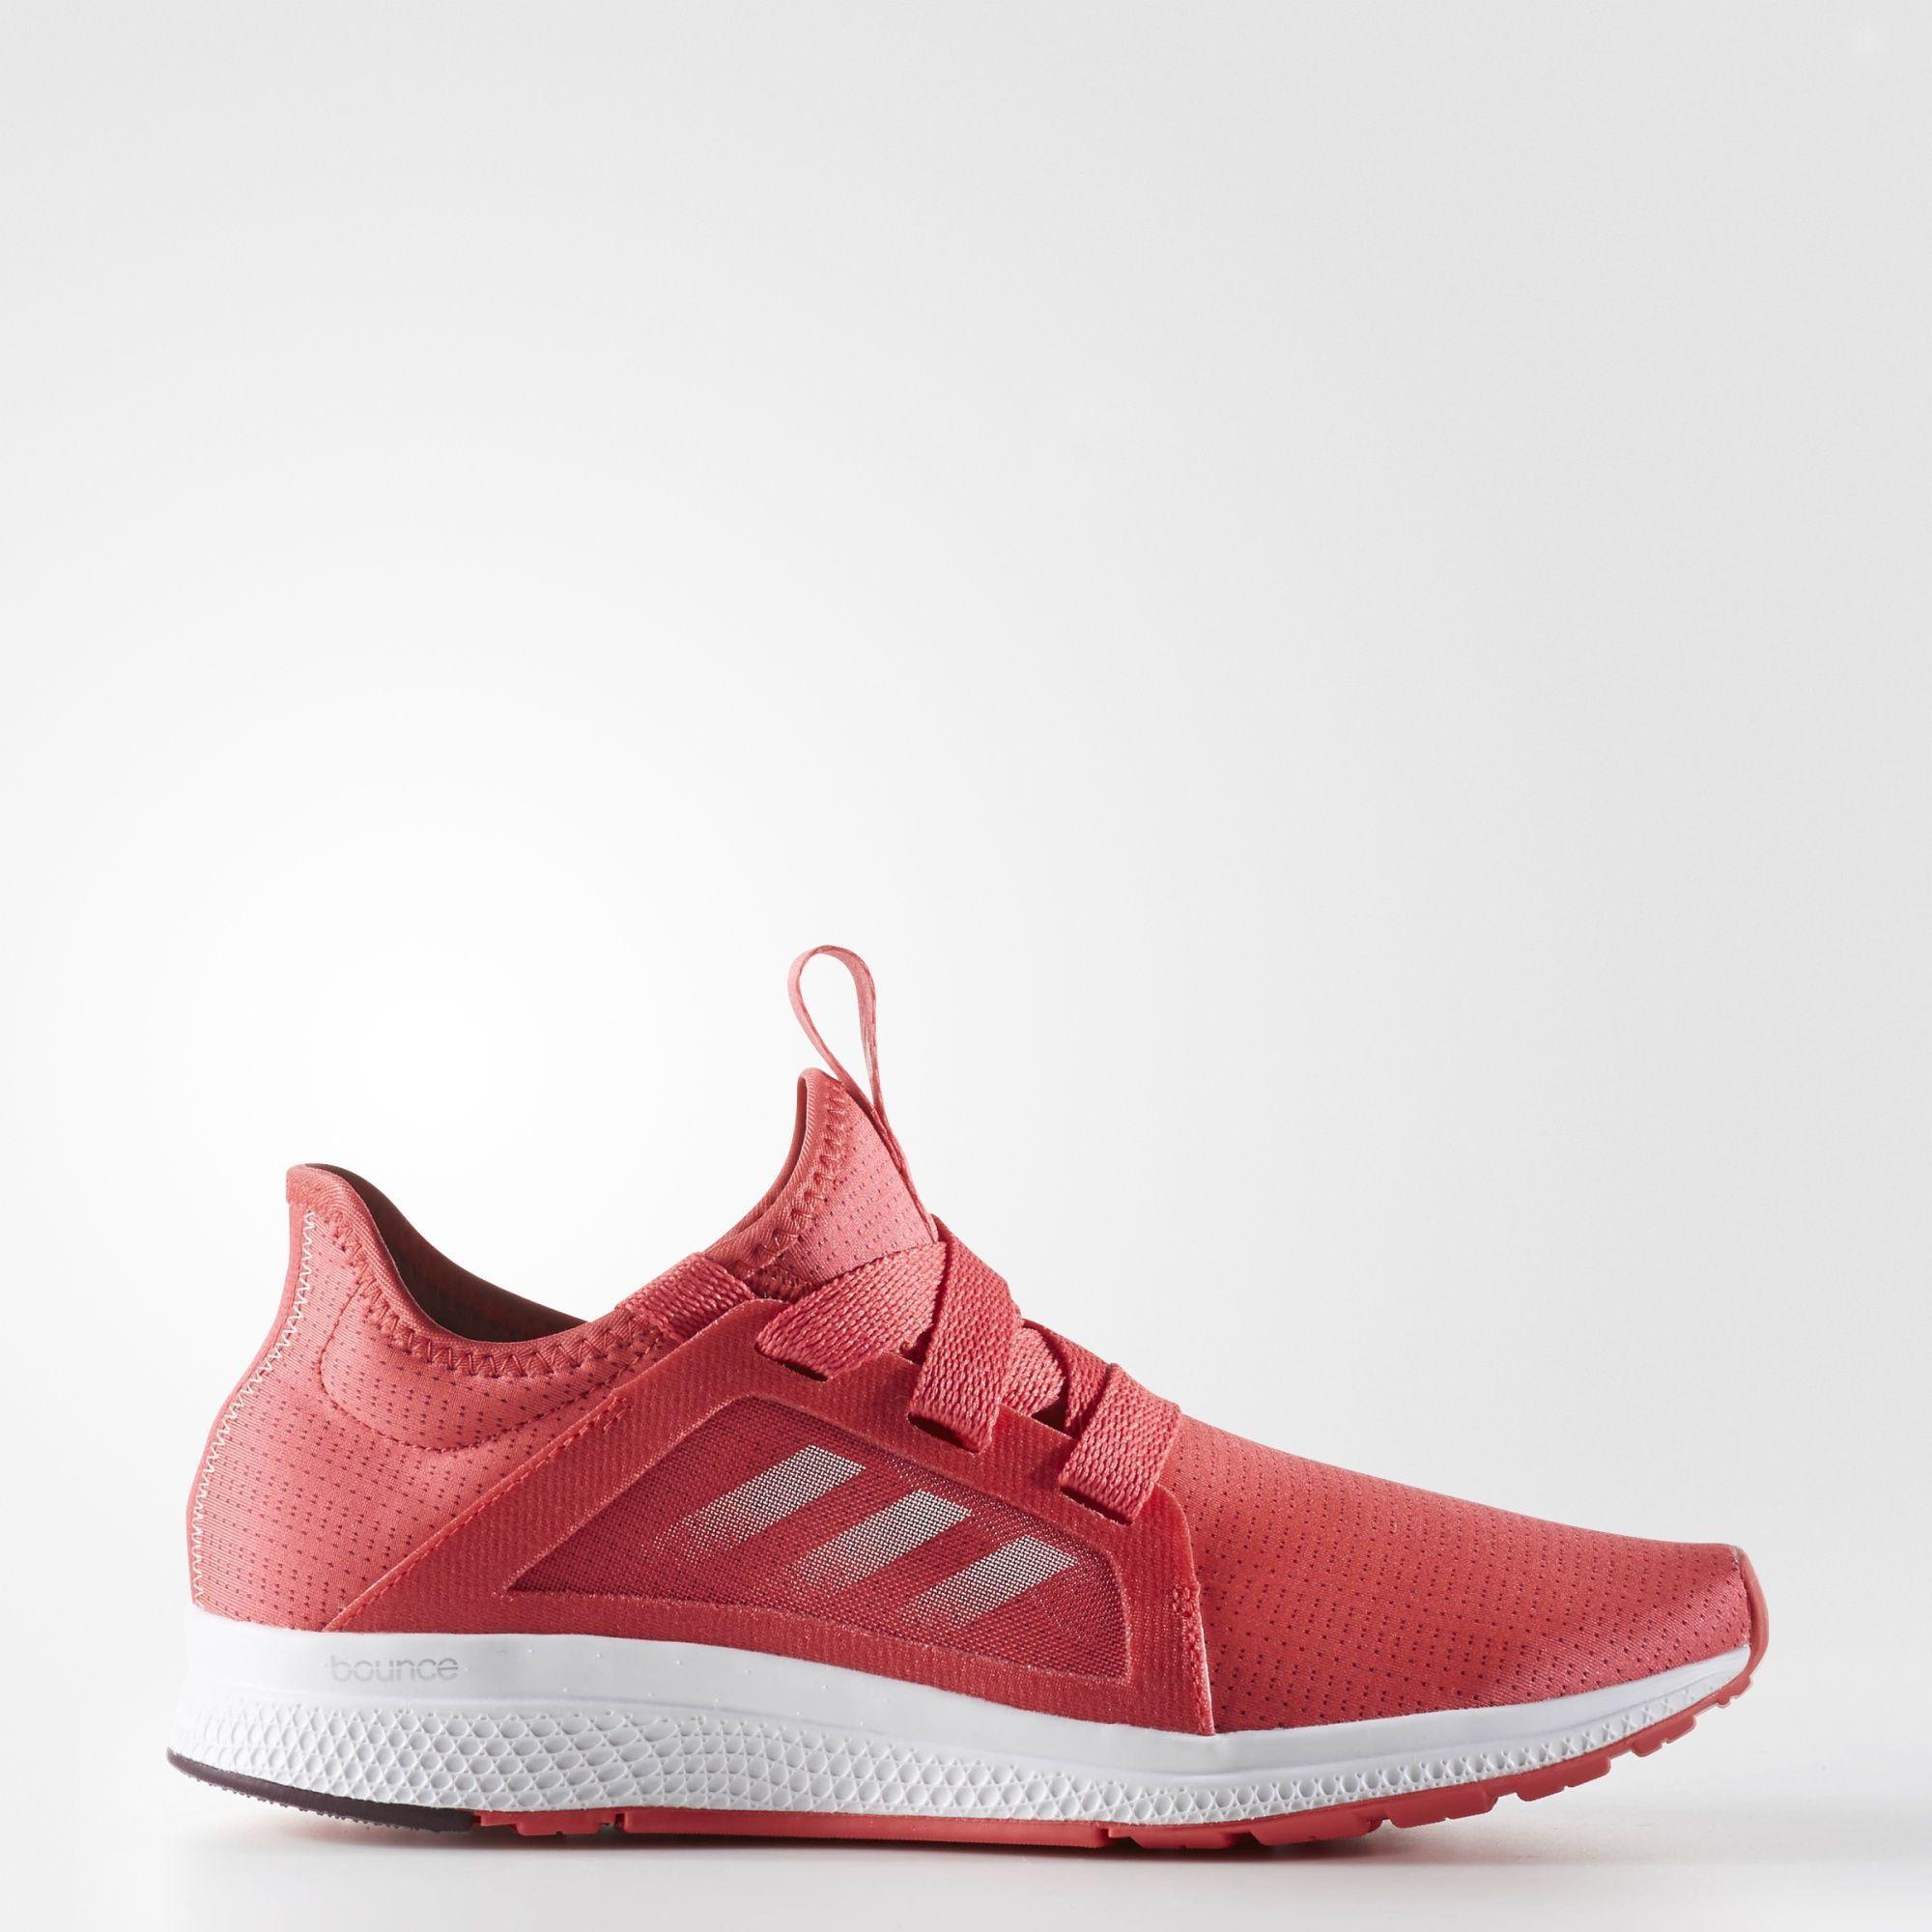 c2a4b00181 Edge Lux Shoes | On my feet | Adidas, Adidas running shoes, Adidas ...